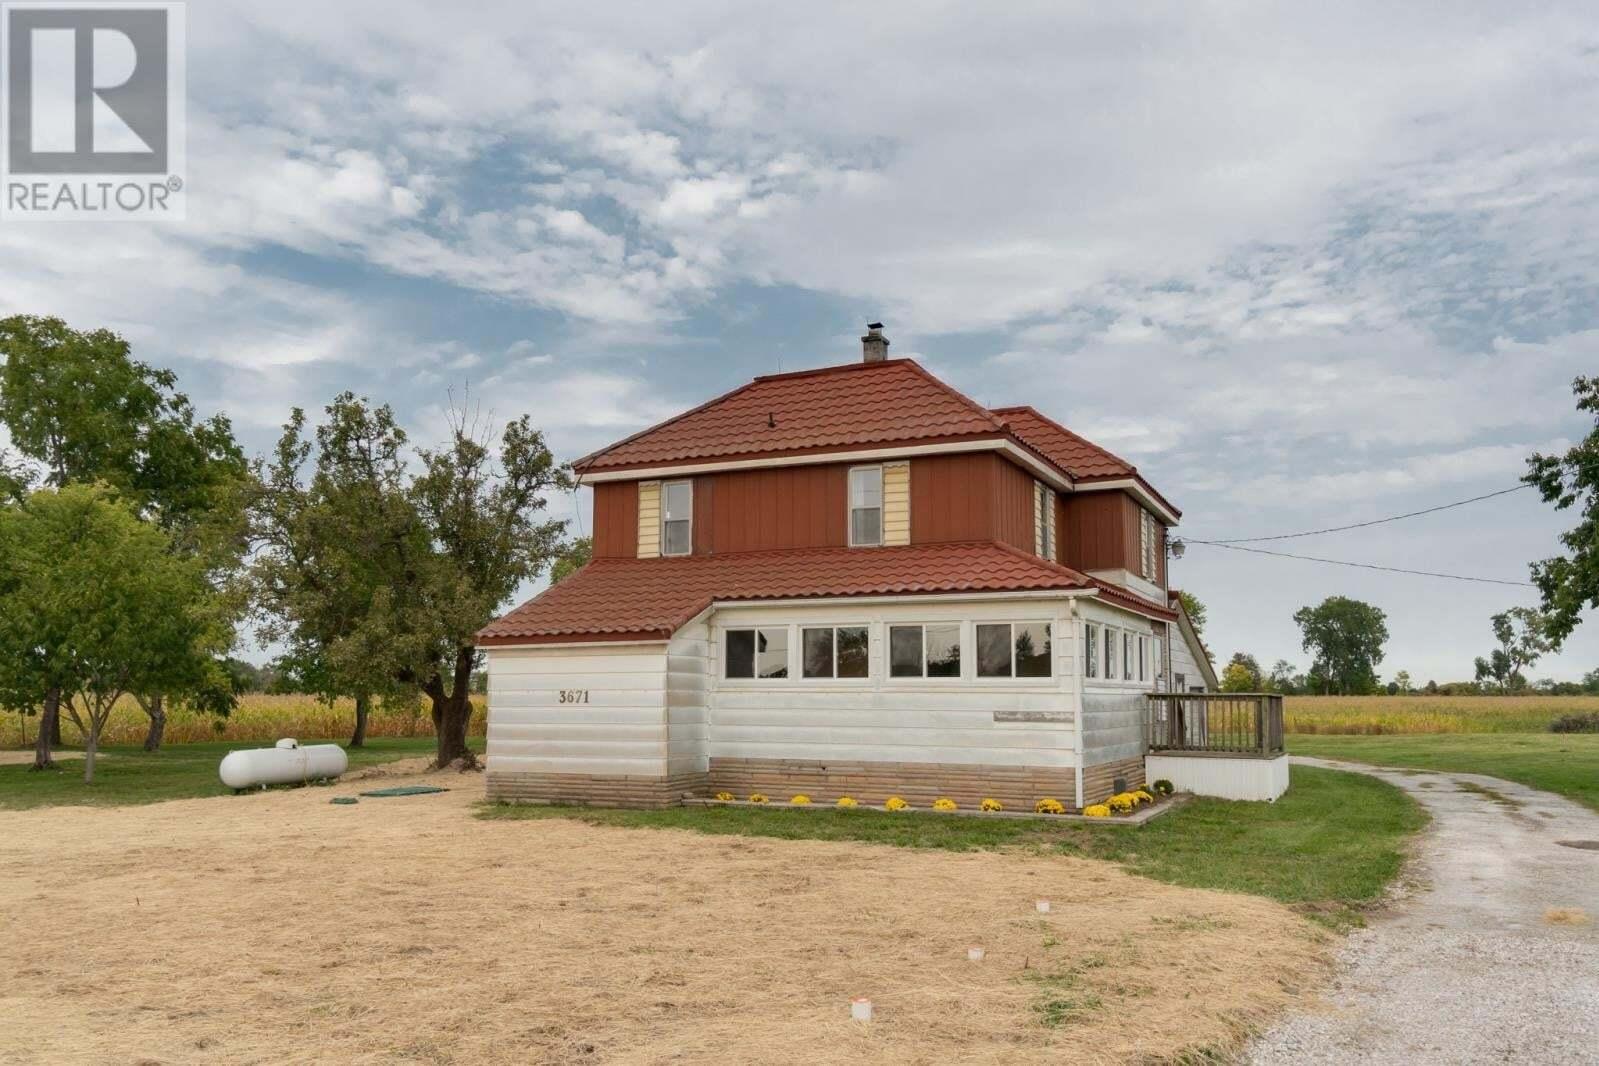 House for sale at 3671 Creek Creek Amherstburg Ontario - MLS: 20012552